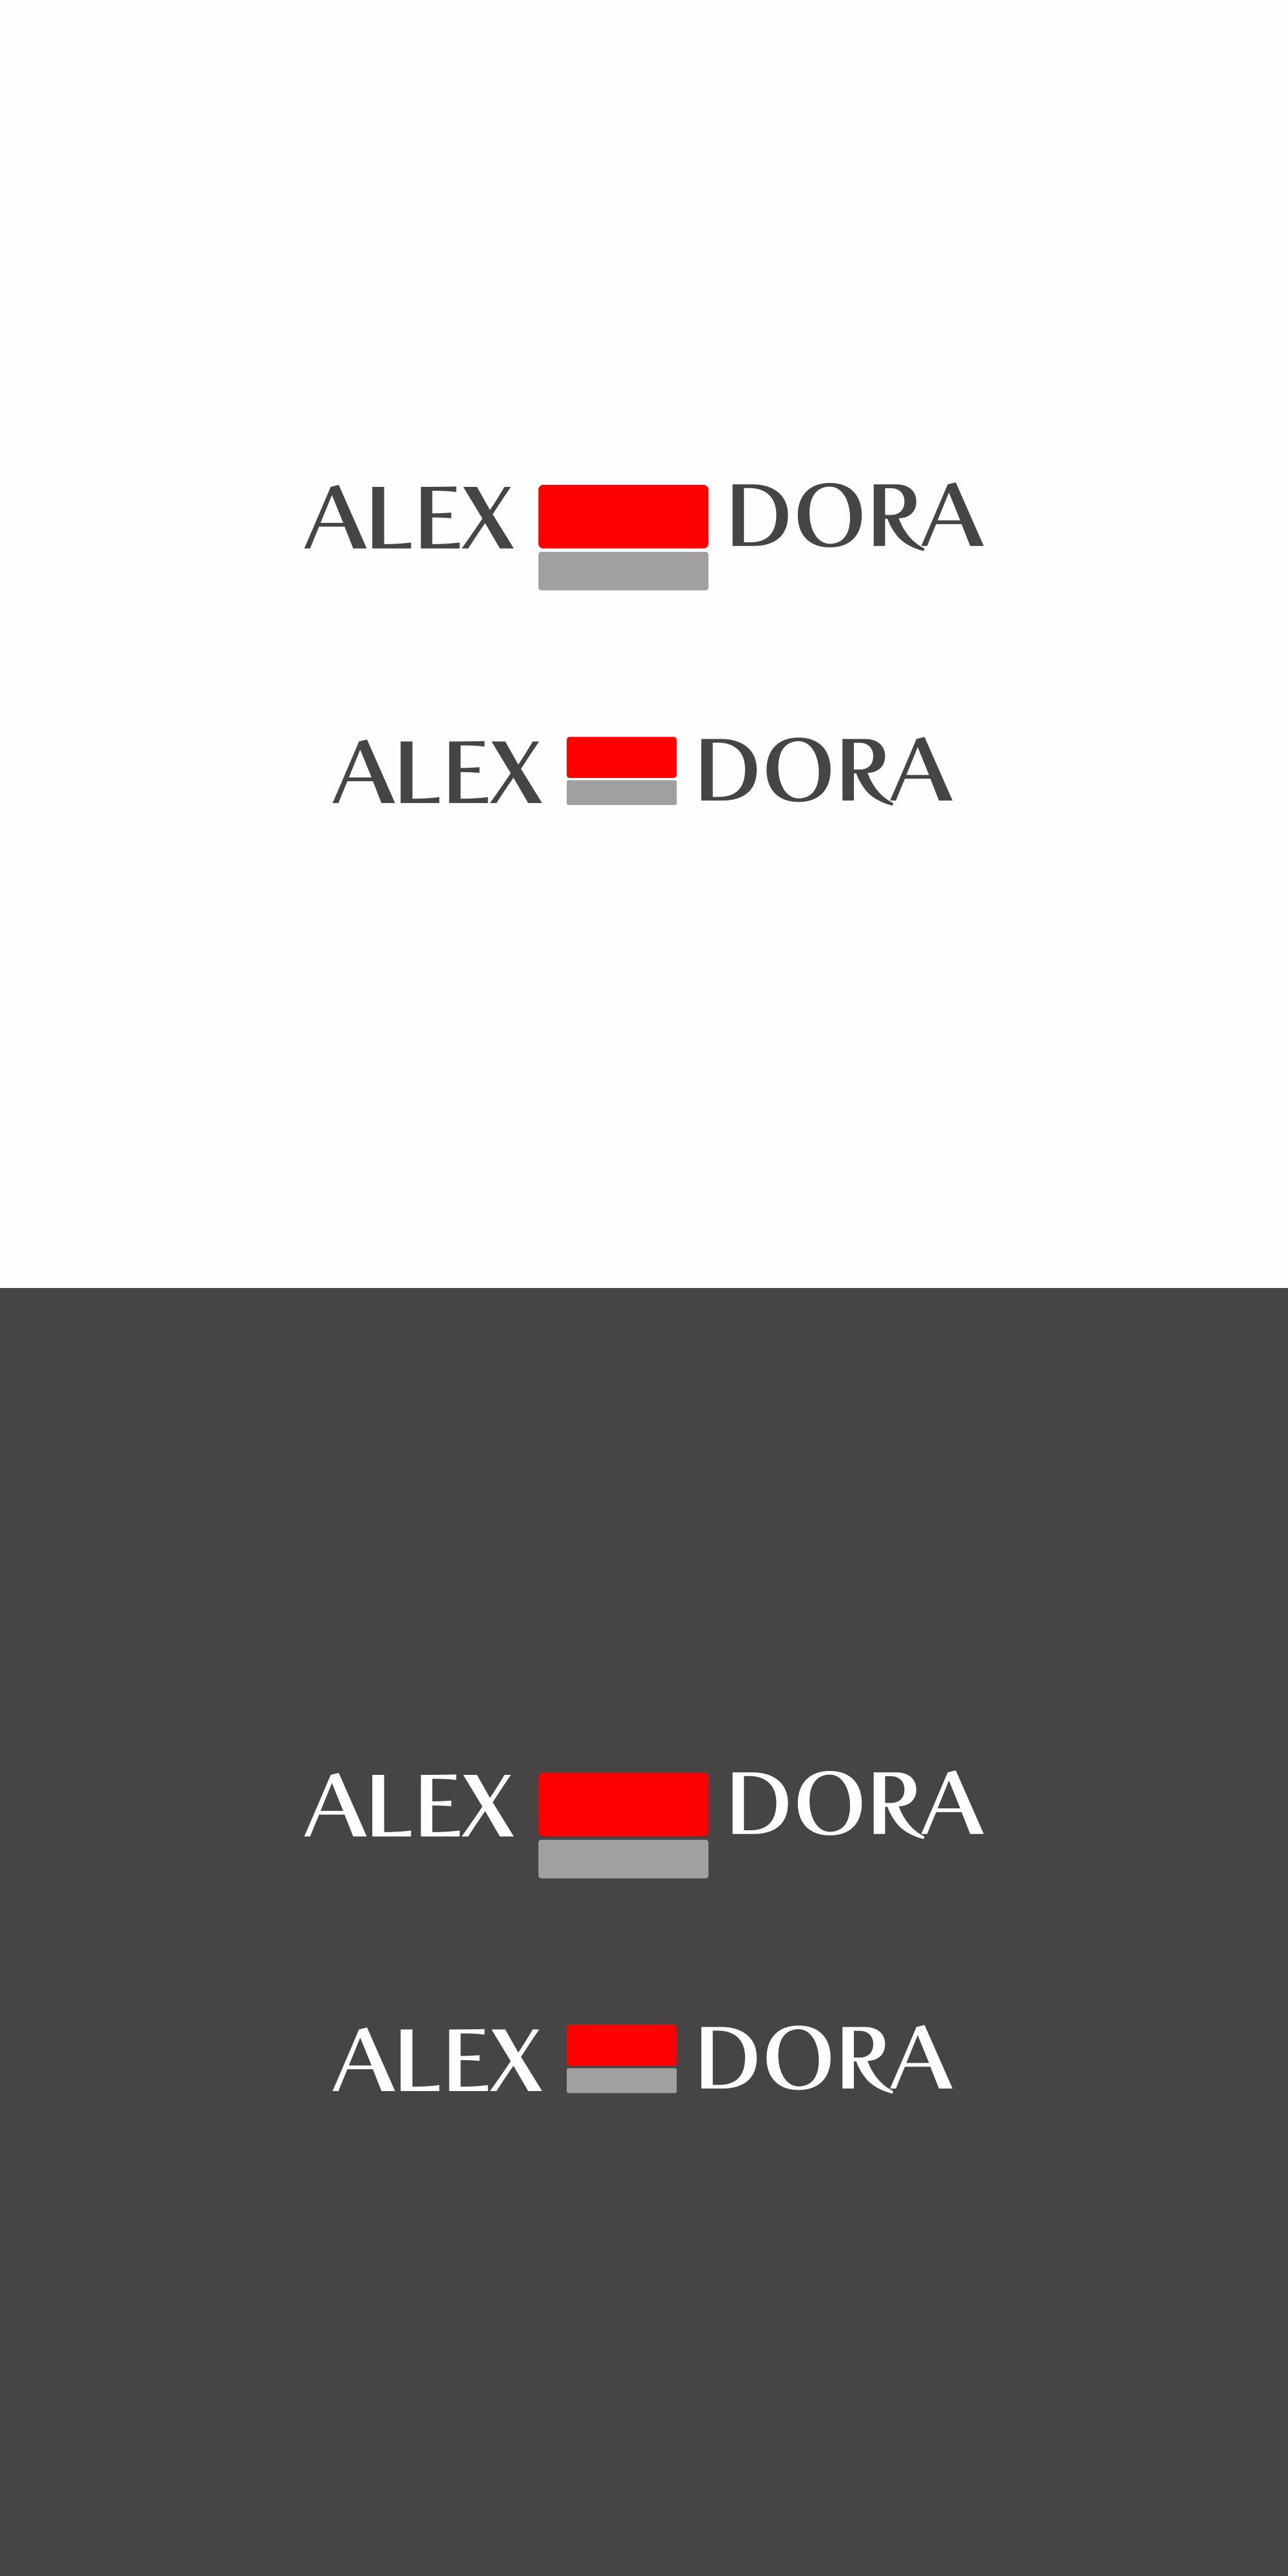 Необходим дизайнер для доработки логотипа бренда одежды фото f_8405b354ab3e49f5.jpg